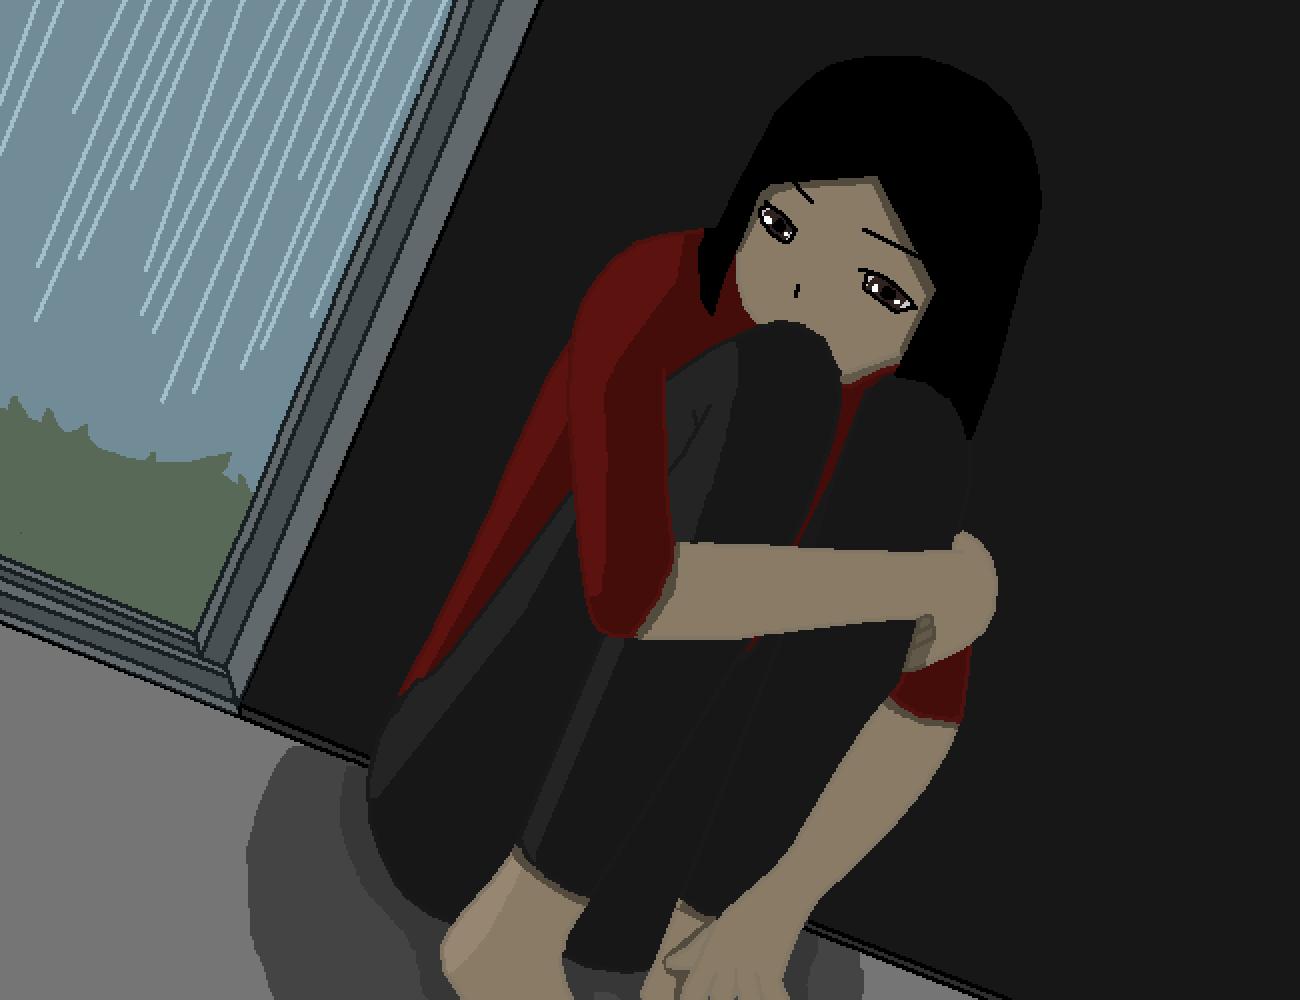 Sitting Around on Rainy Day by KawaiiMouse